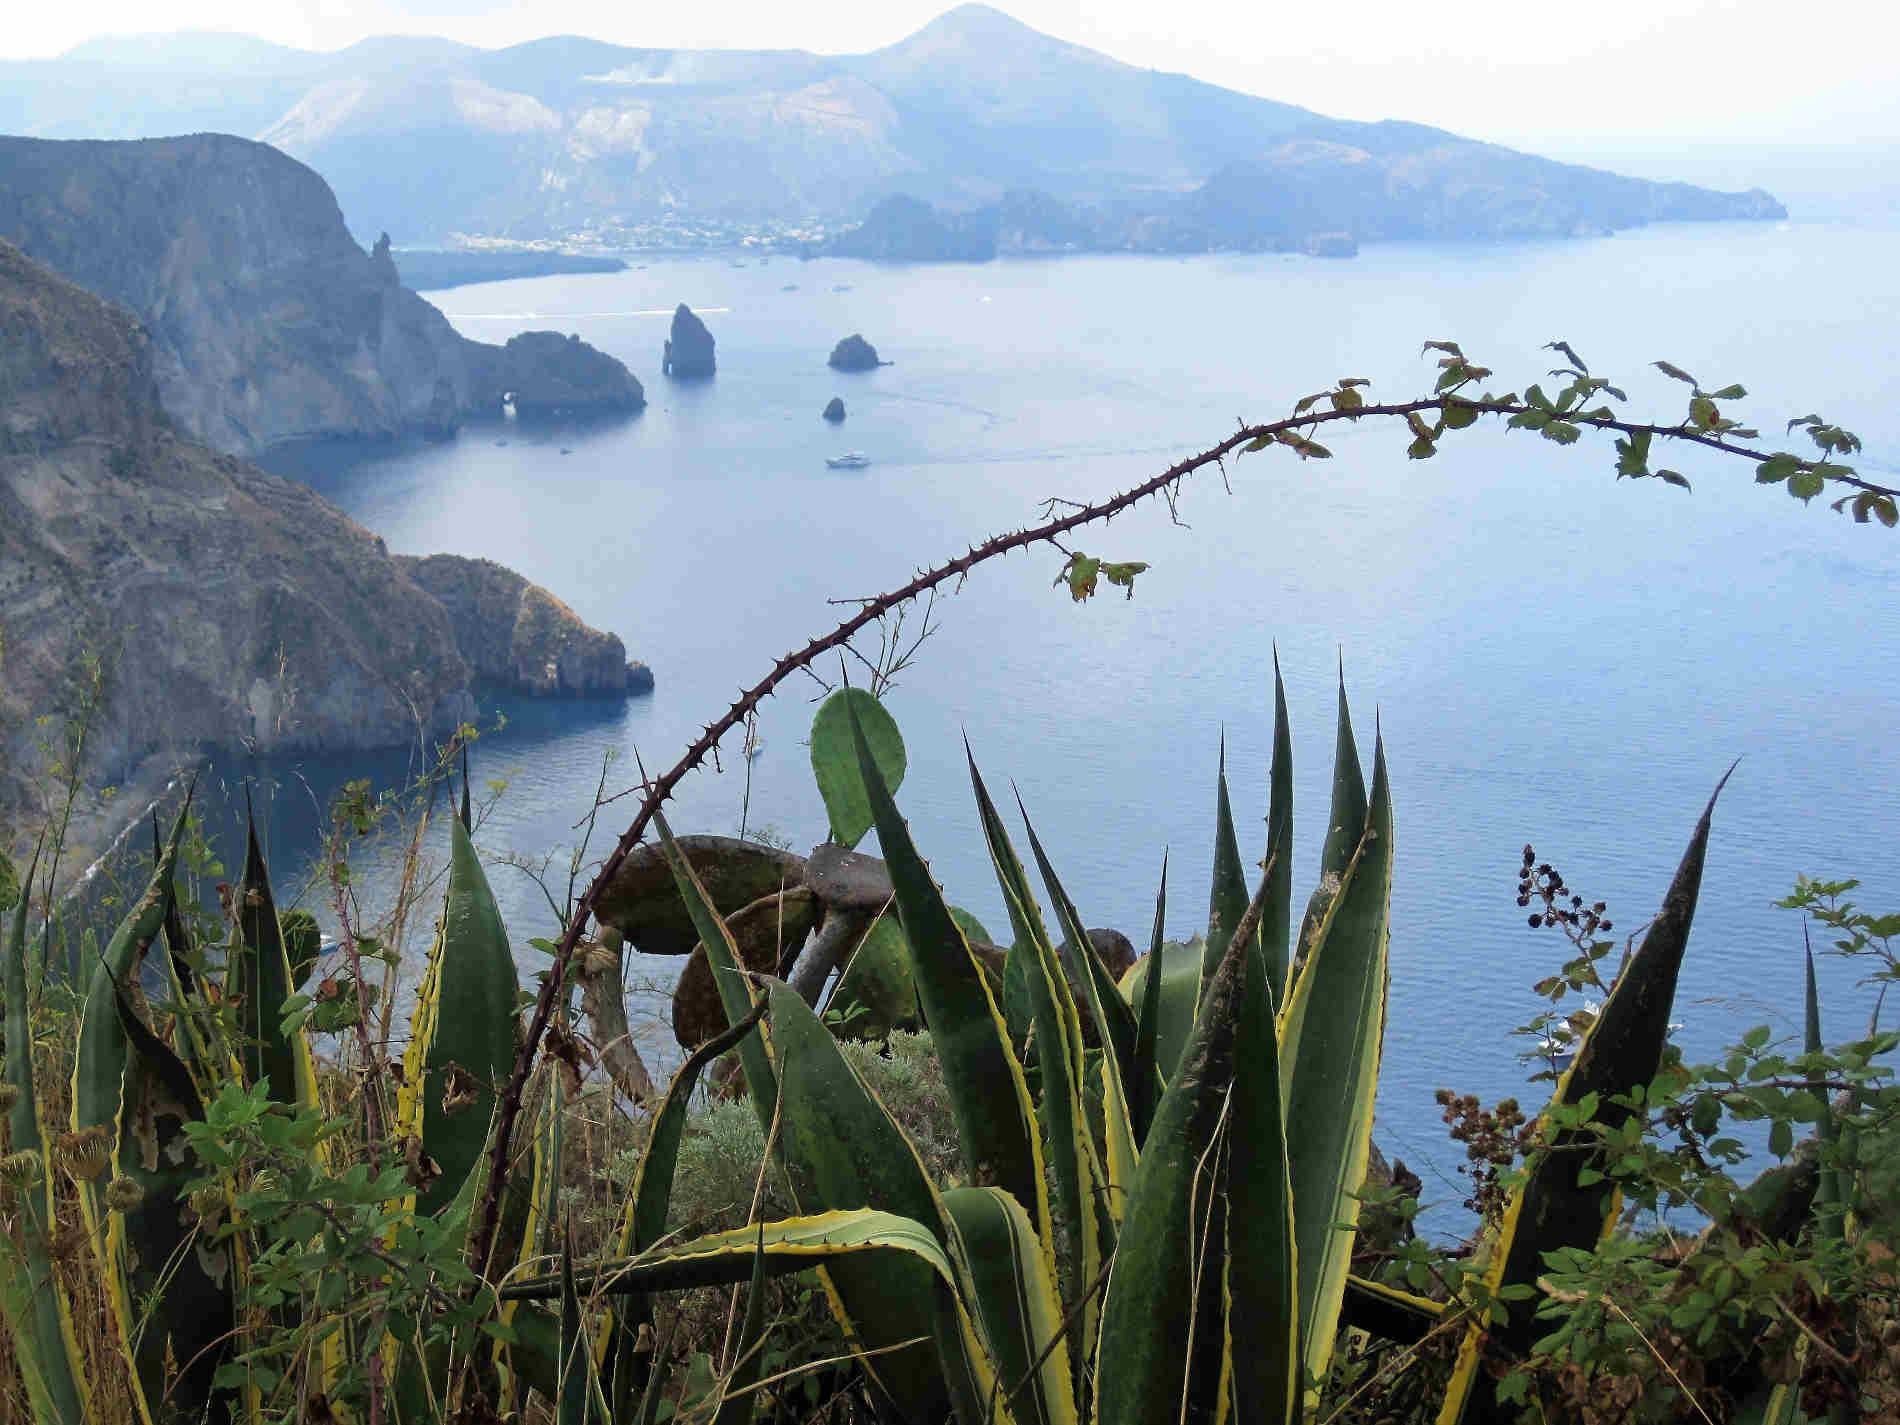 Guida alla visita alle 7 Isole eolie -panorami da Lipari